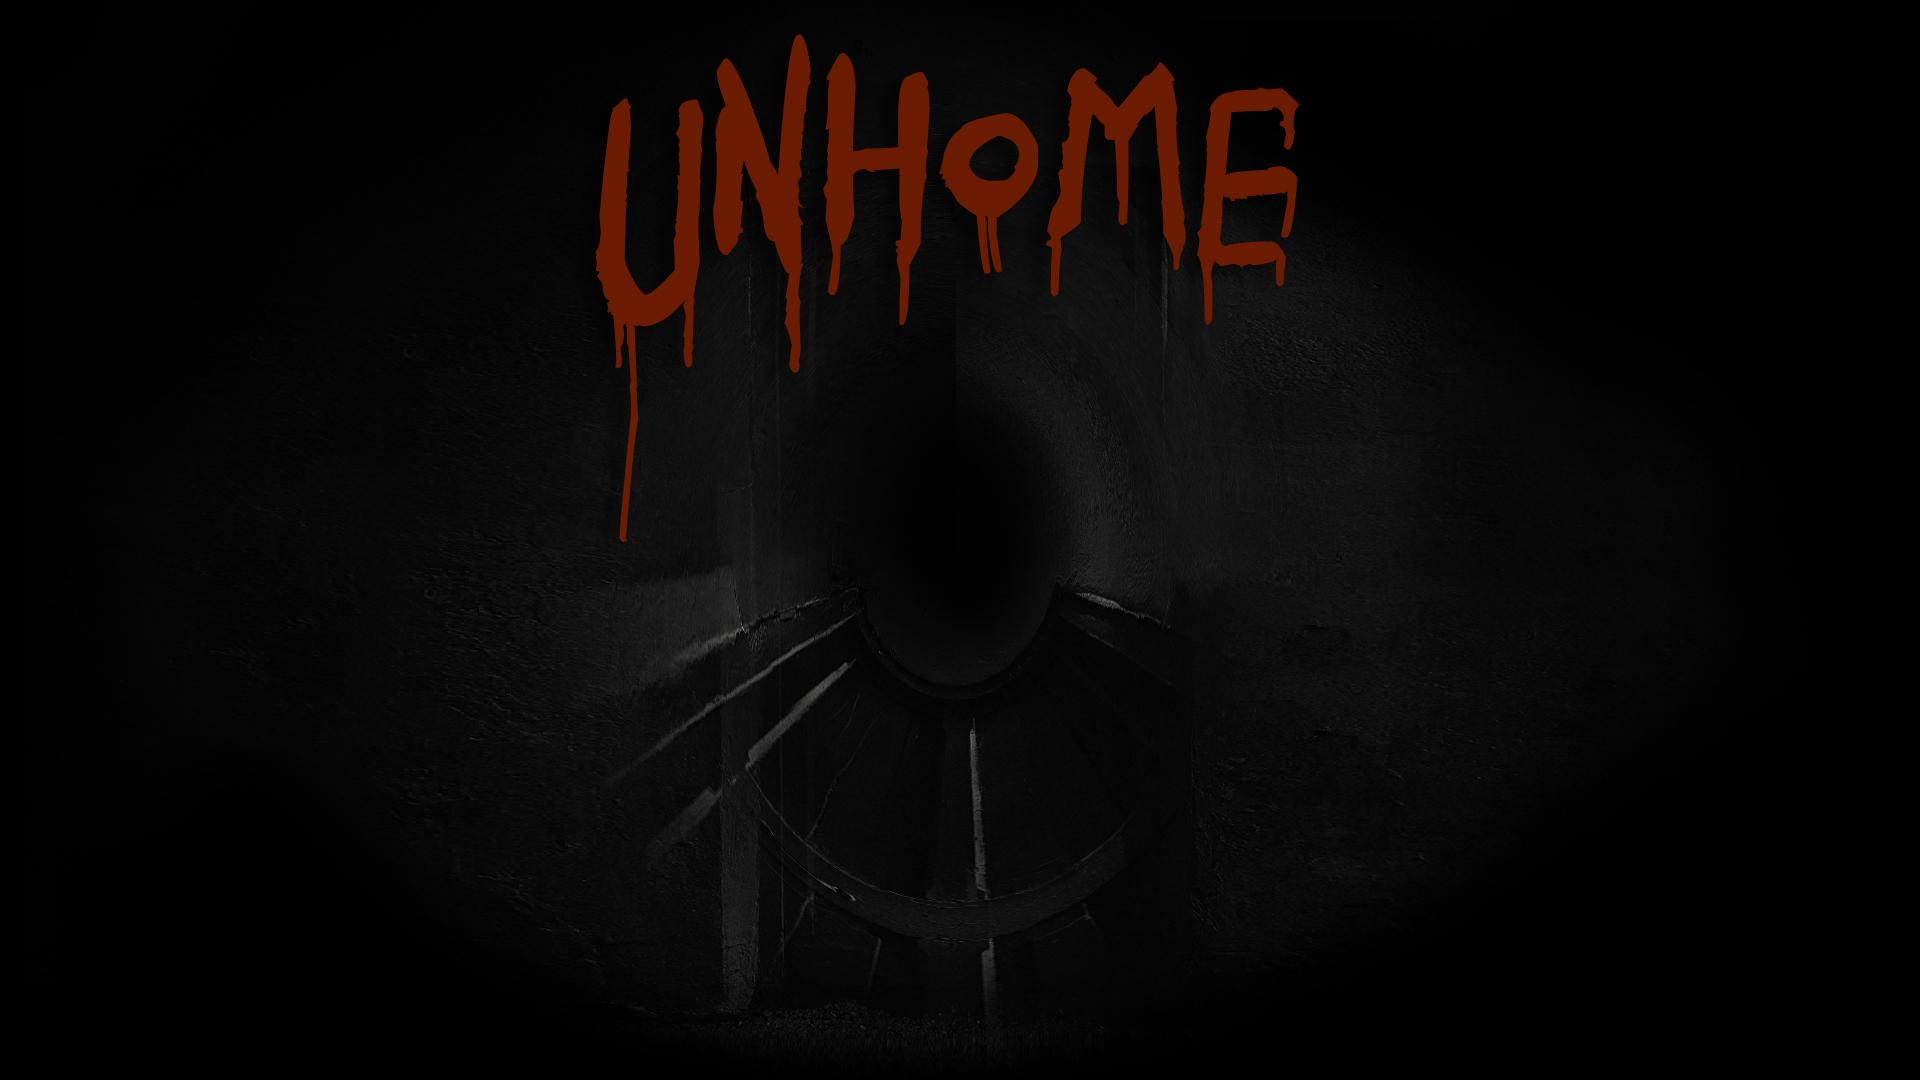 Unhome